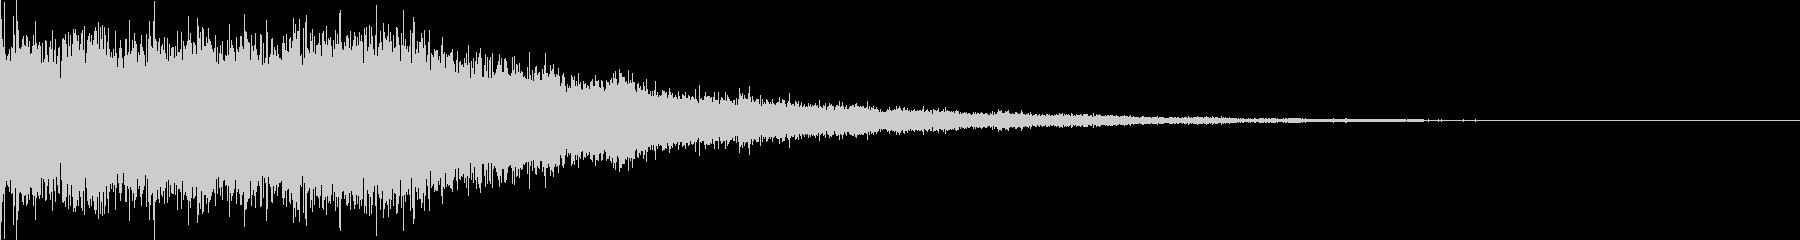 氷魔法03(冷気属性魔法)の未再生の波形